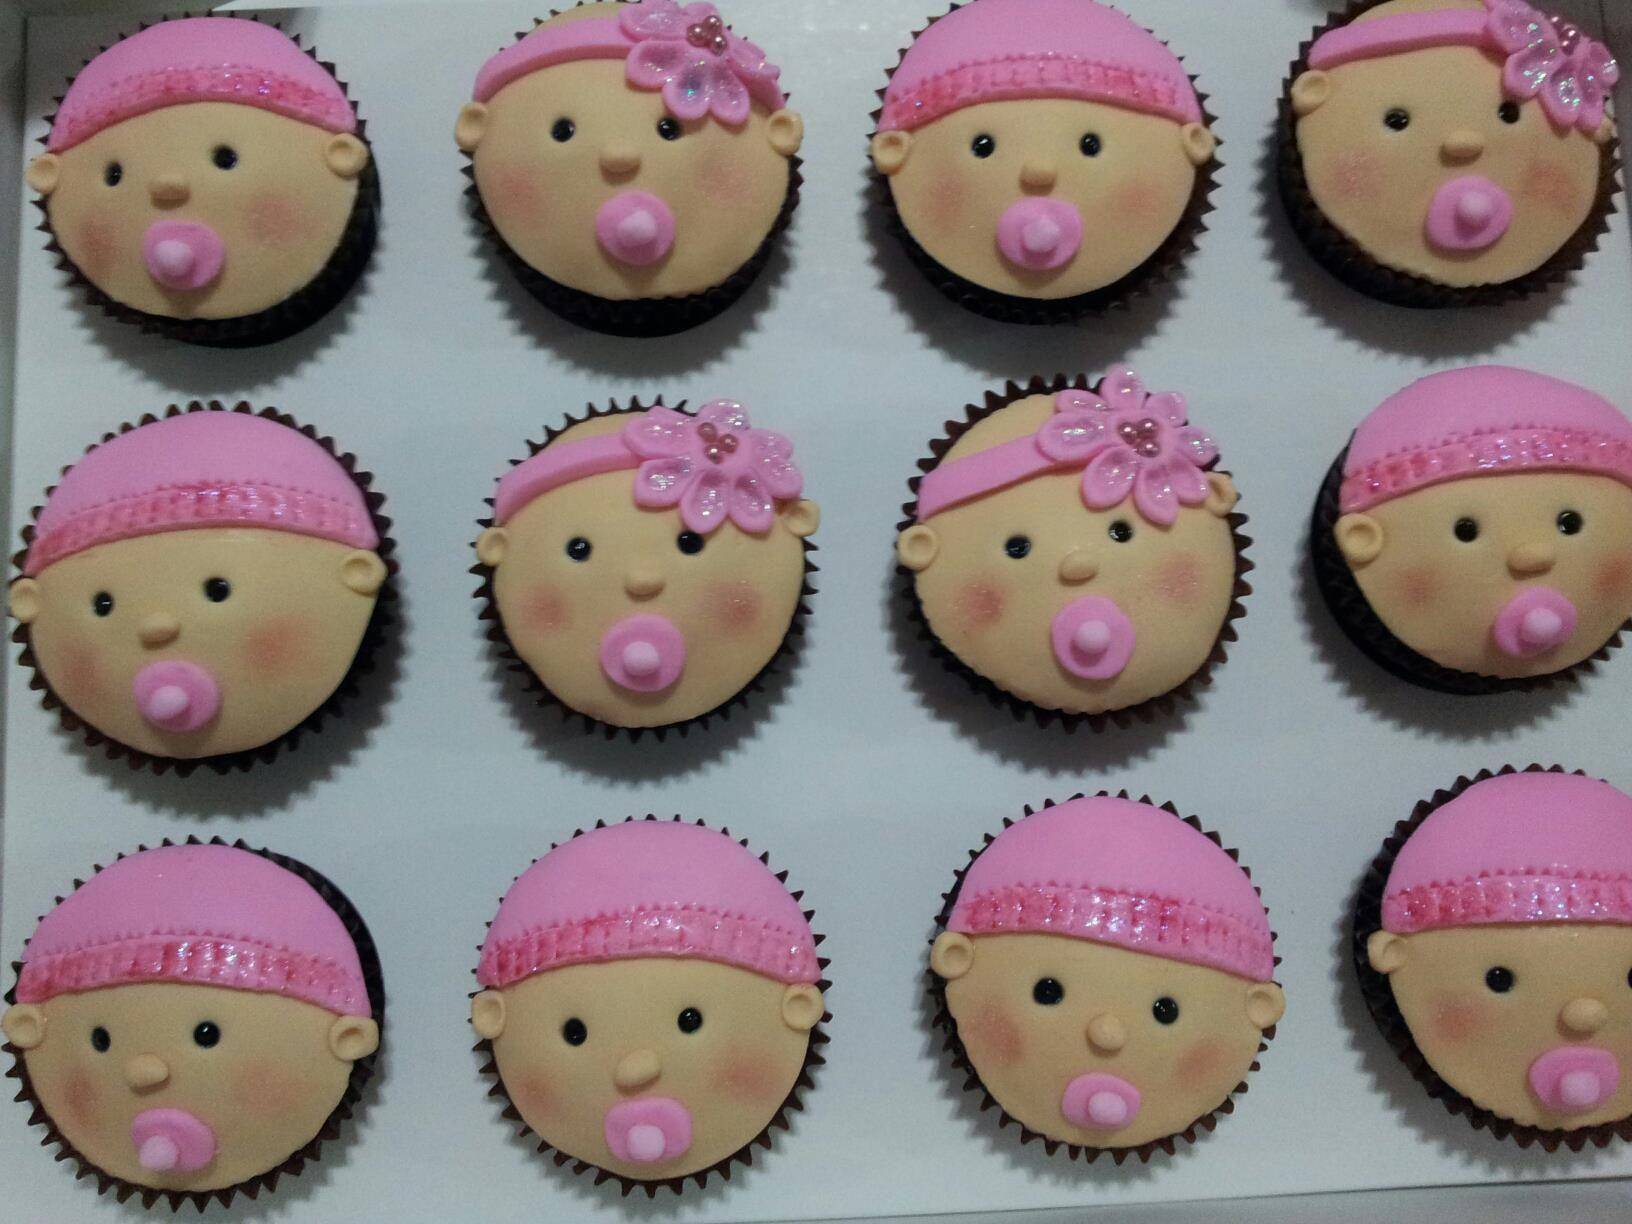 Baby Shower Cupcake Ideas On Pinterest : baby shower cupcake ideas Cute cupcake ideas created by ...